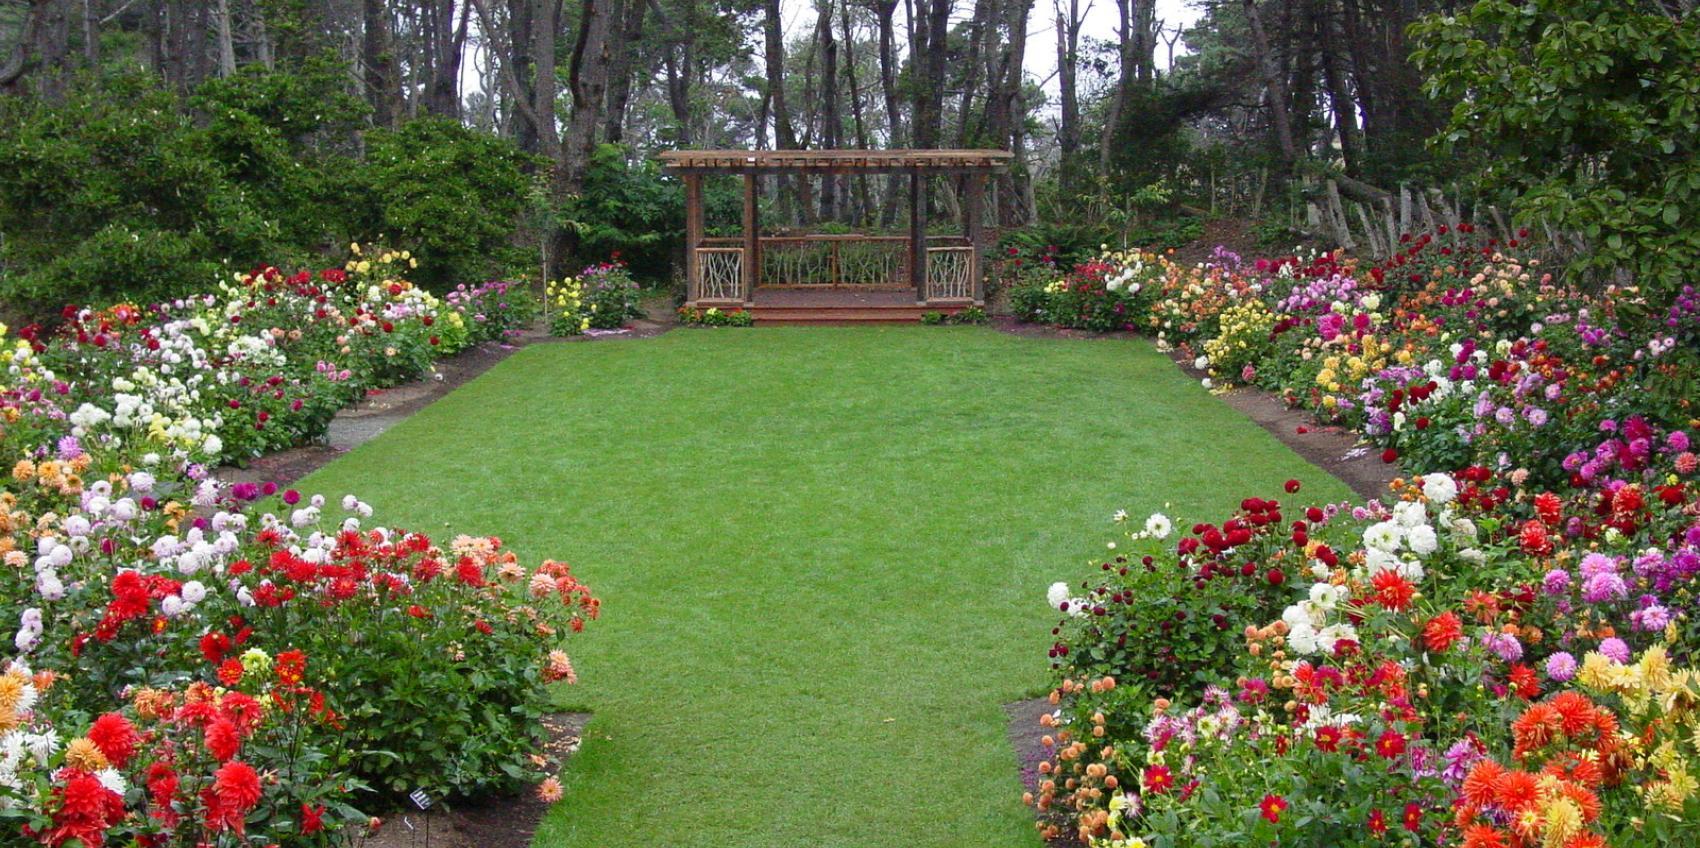 Mendocino Coast Botanical Gardens American Public Gardens Association